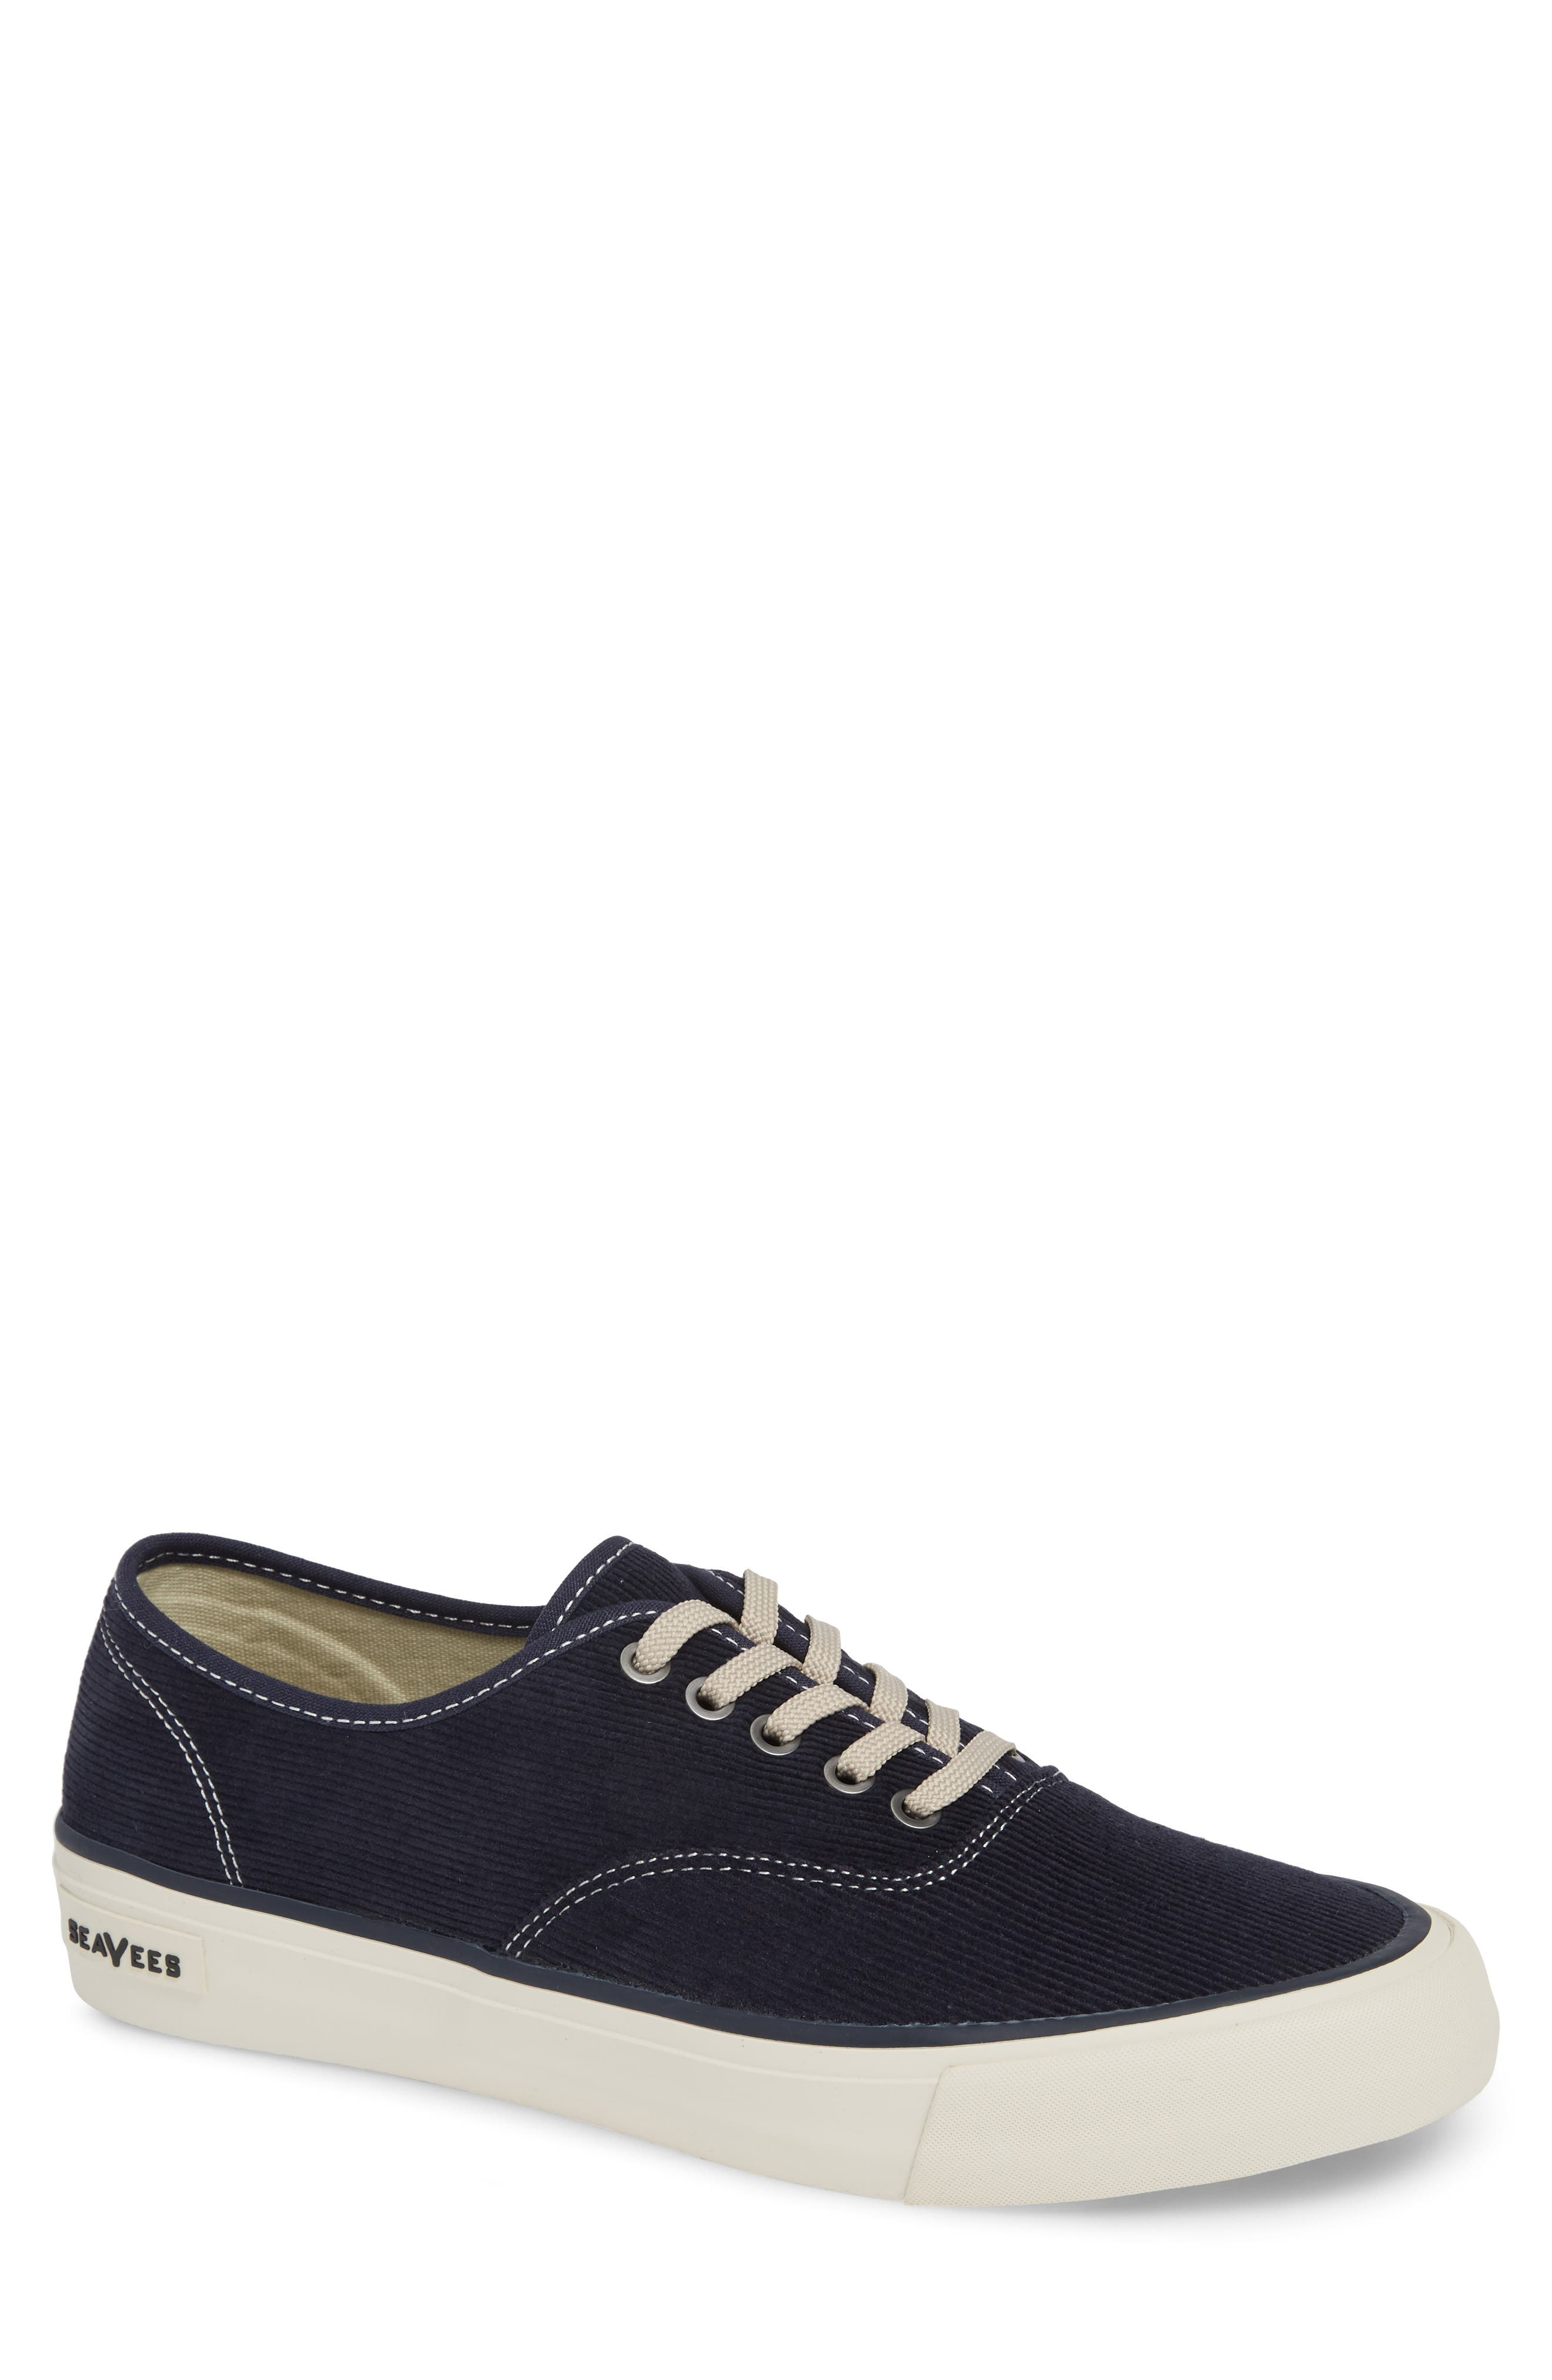 Legend Cordies Sneaker,                         Main,                         color, DEEP NAVY